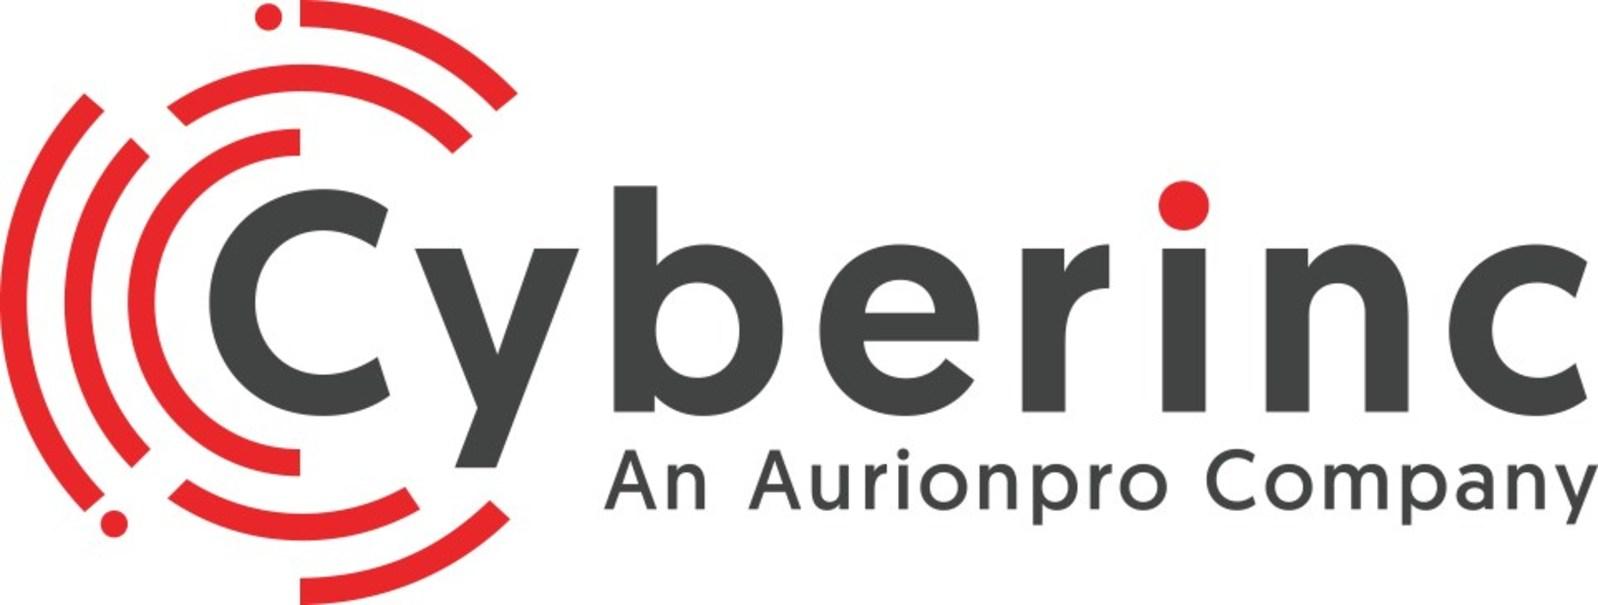 Cyberinc